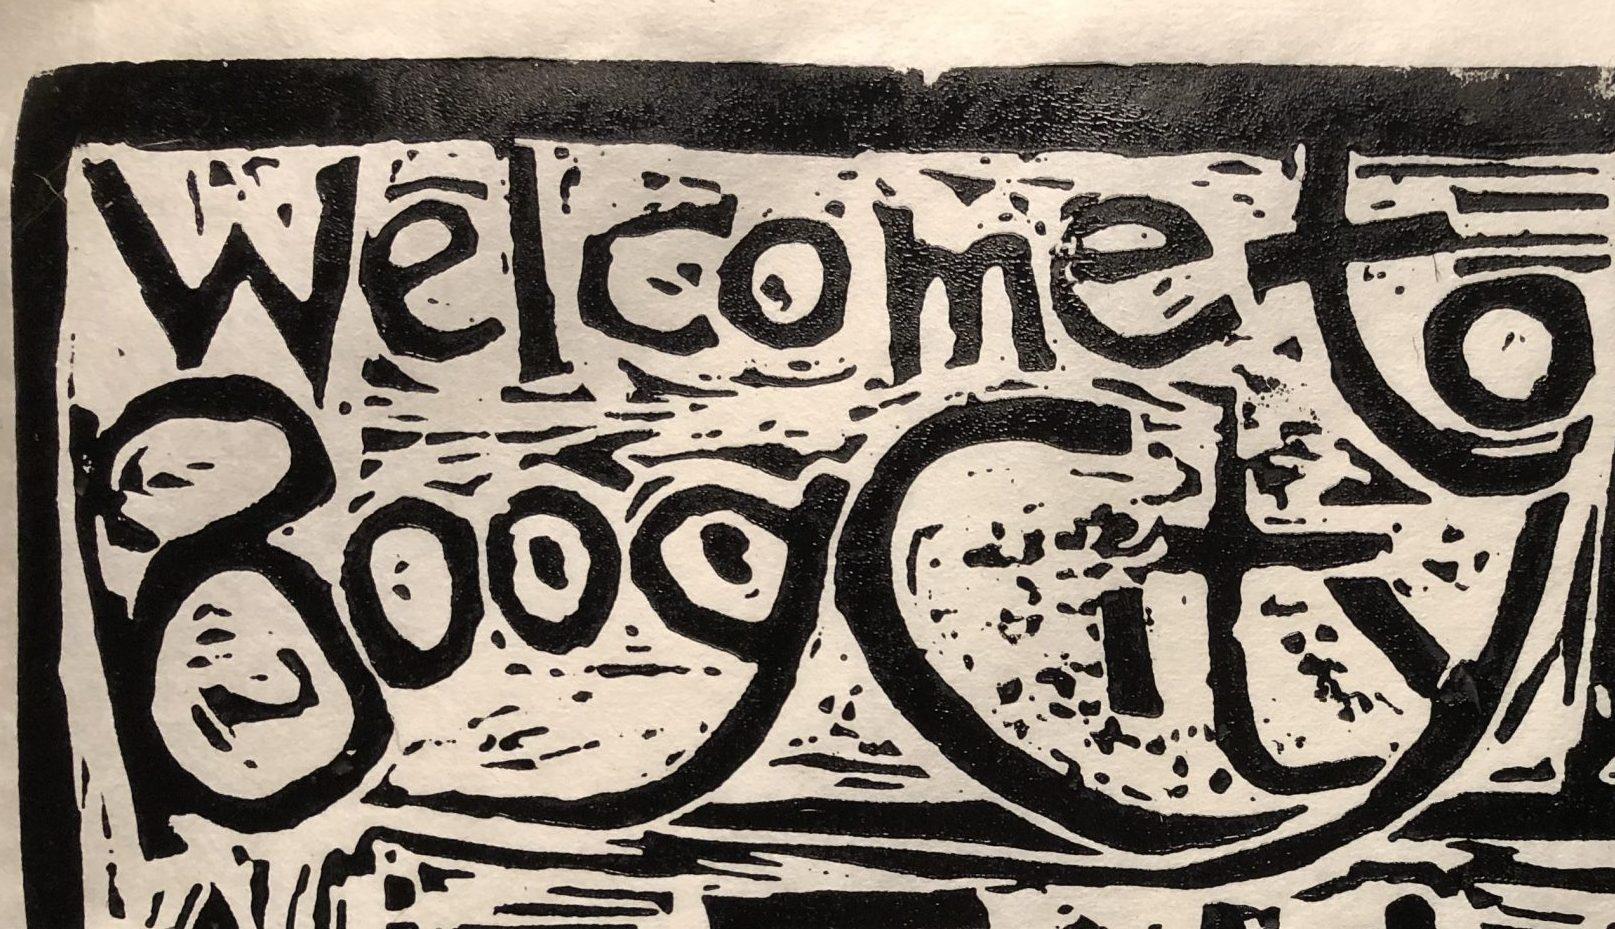 Boog City